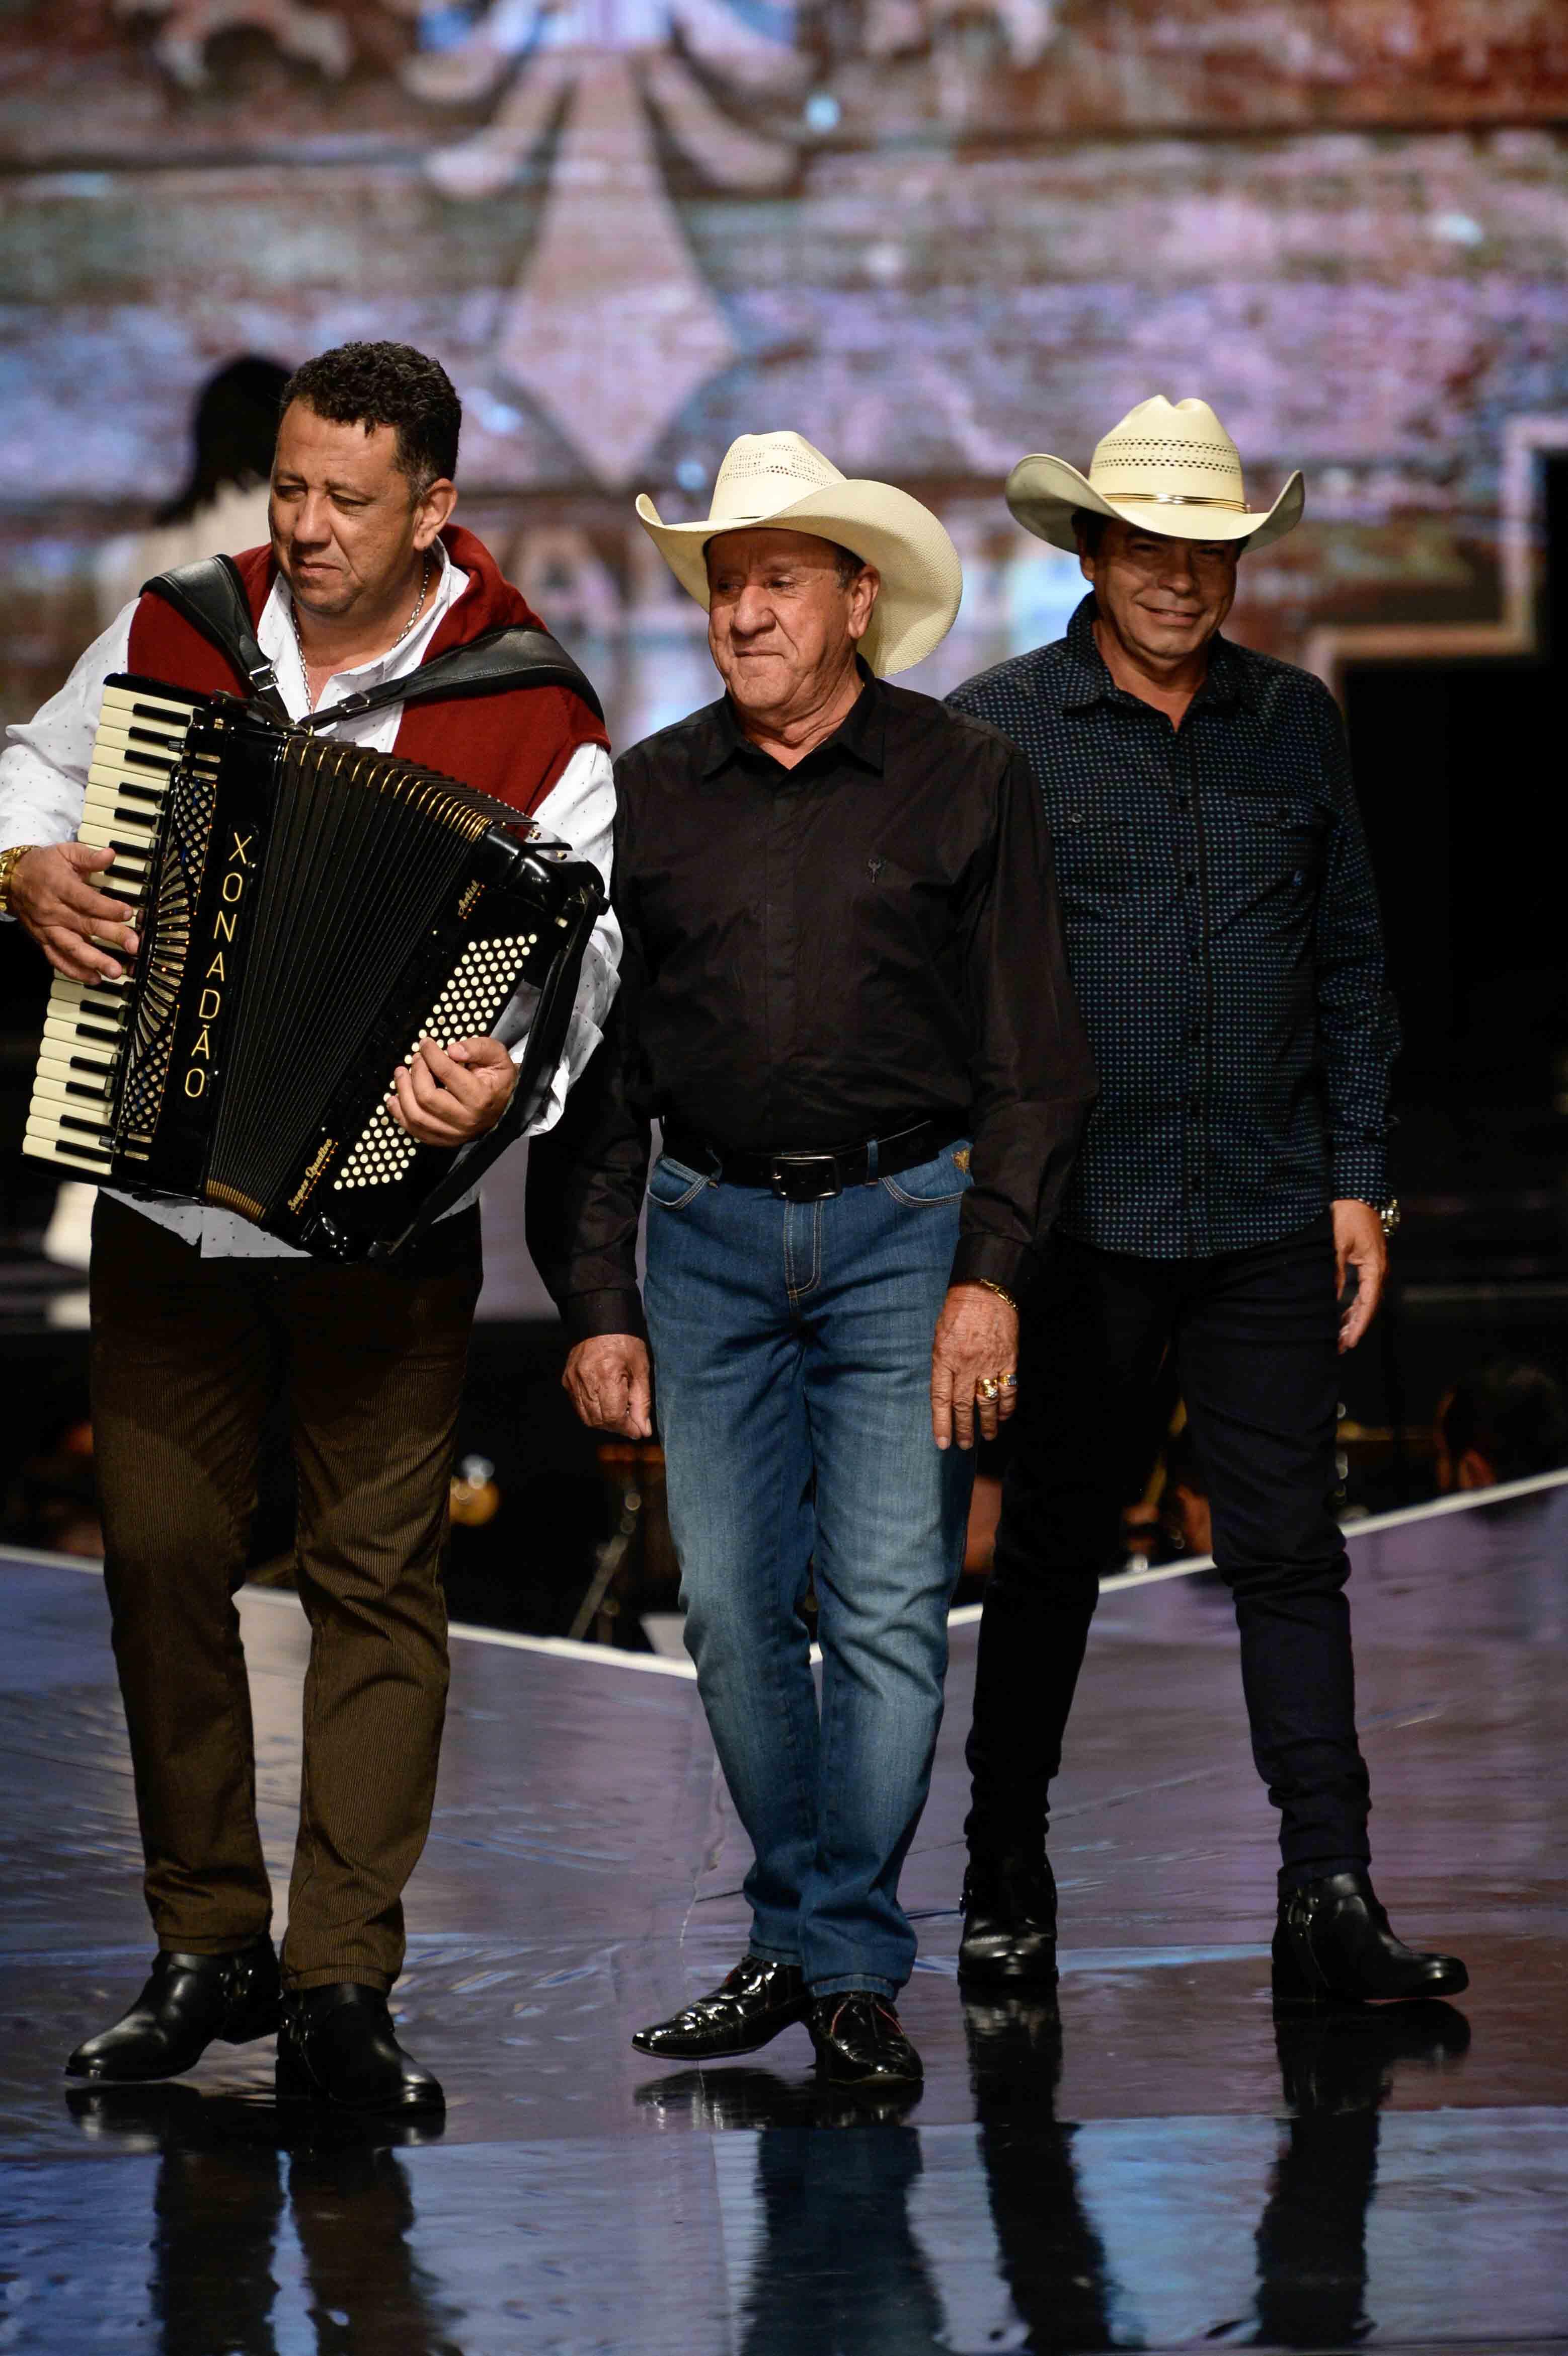 Trio Parada Dura - passarela_cavalera_fernanda-calfat176